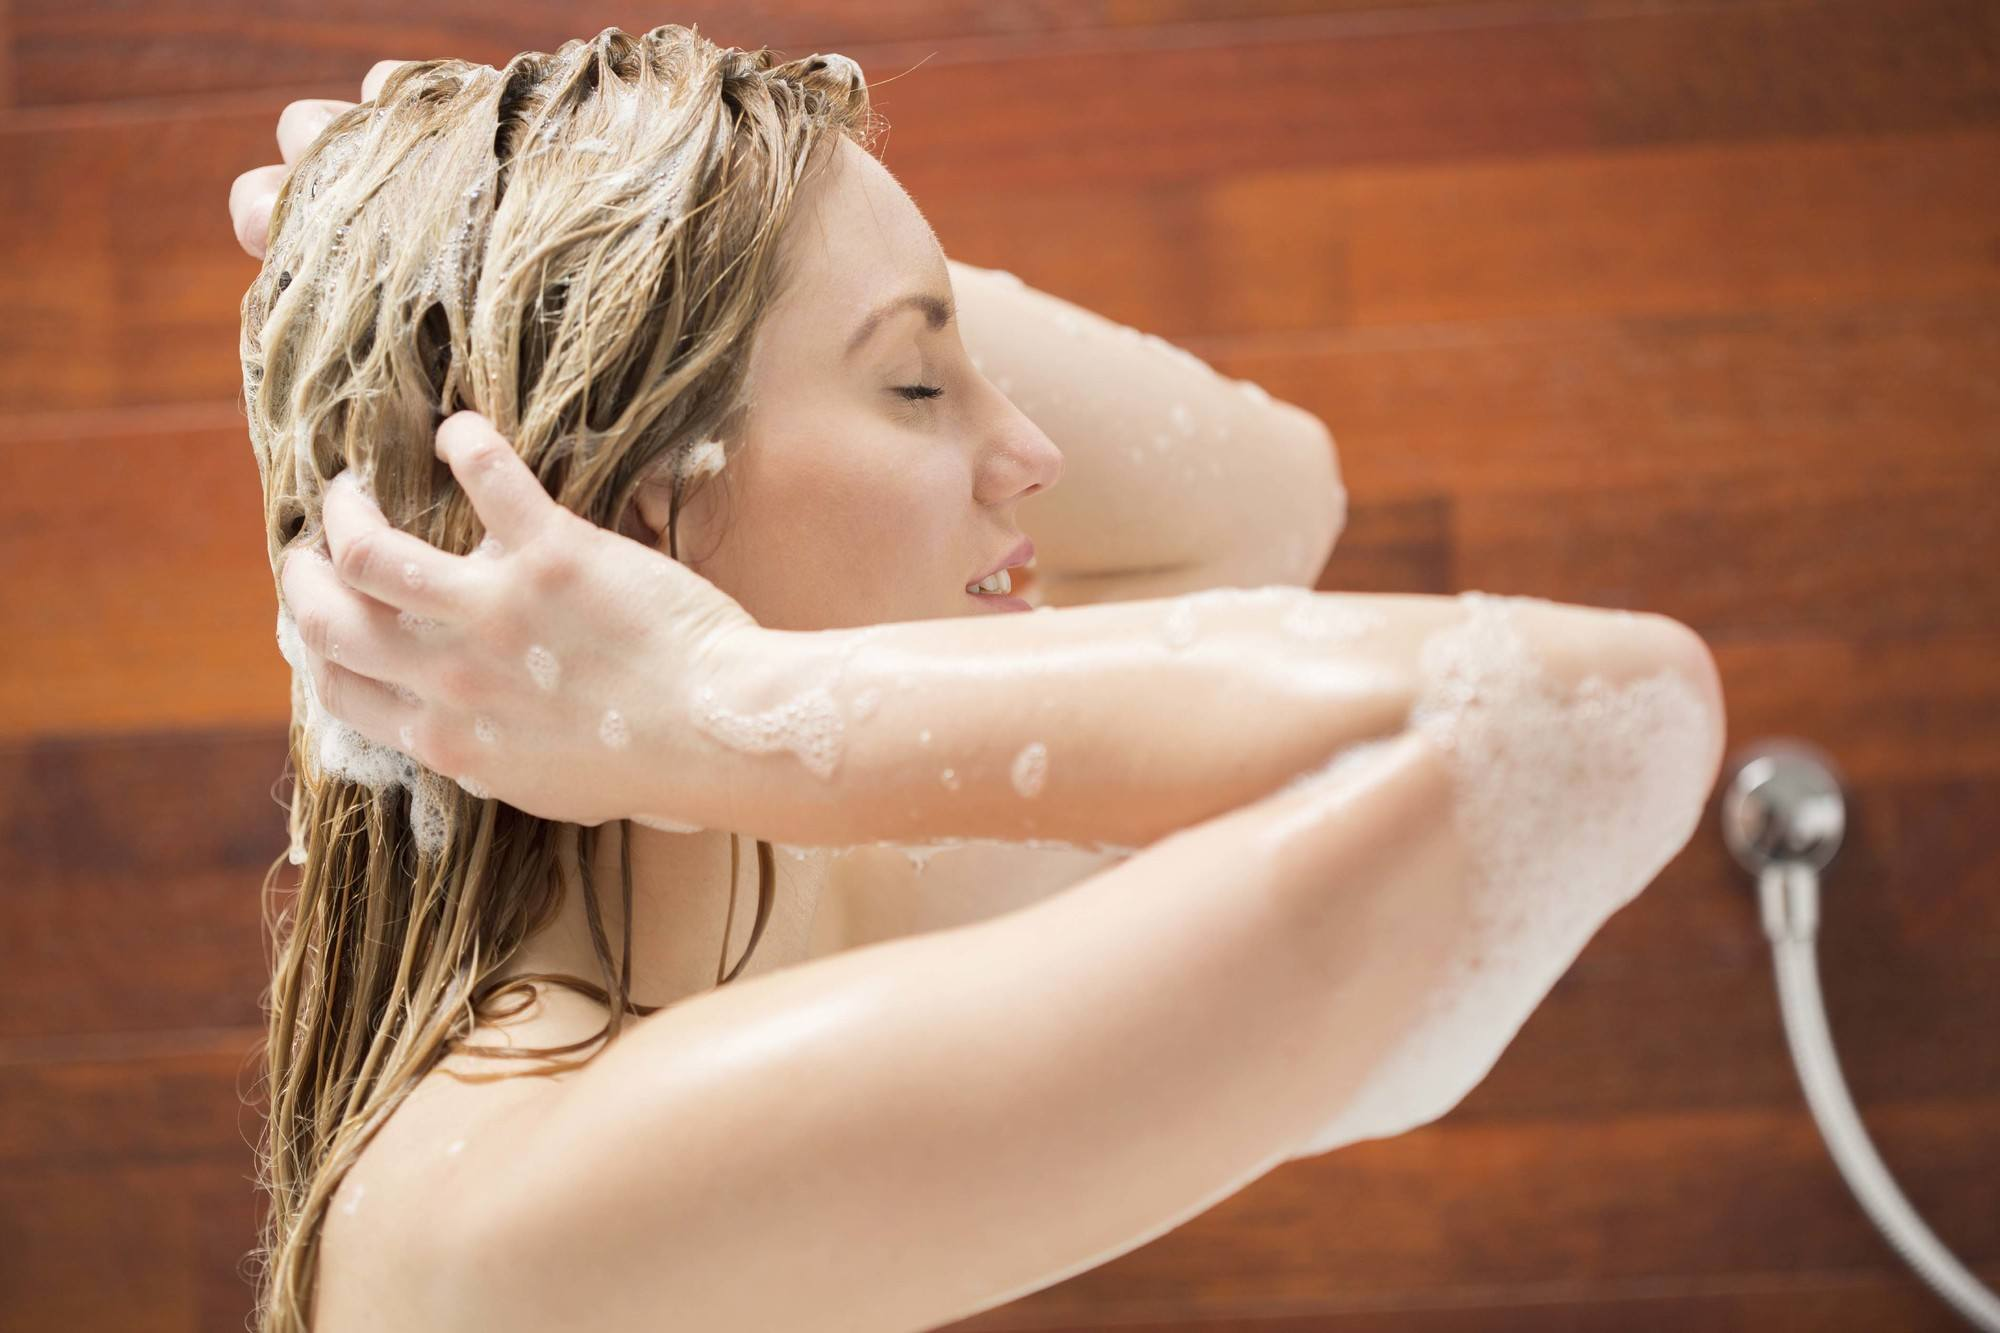 Wanita kaukasia mencuci rambutnya saat mandi